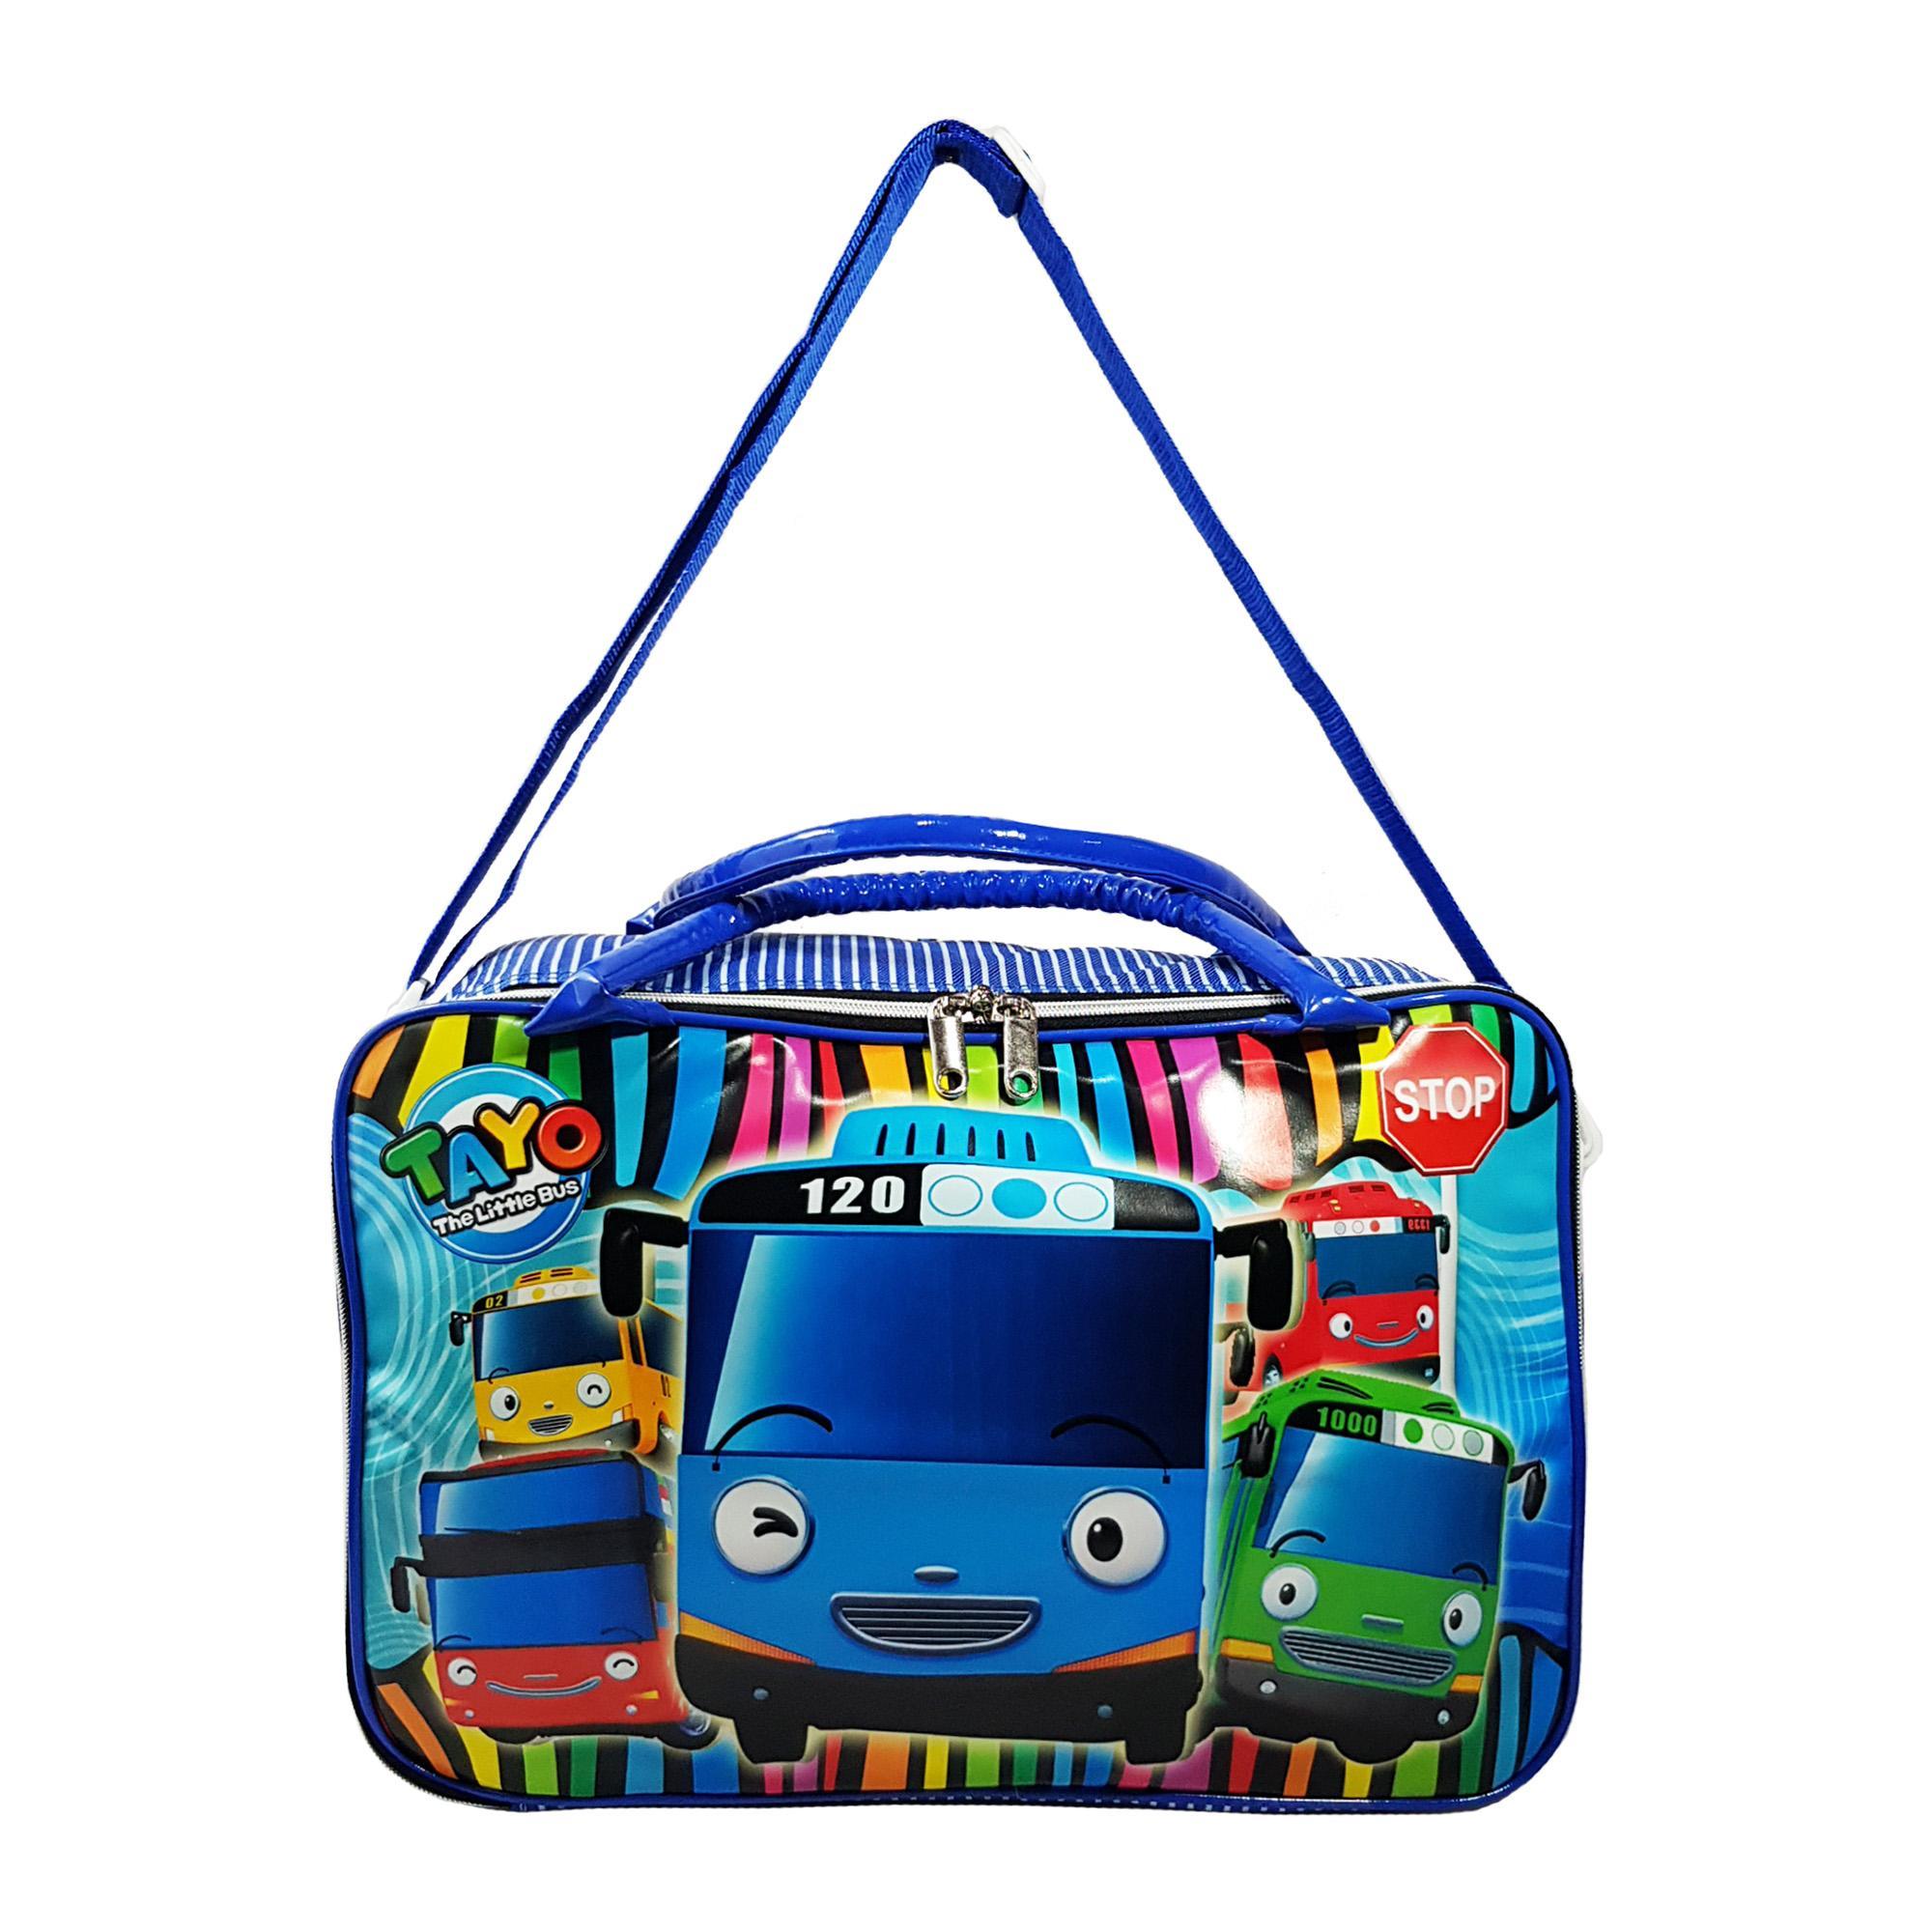 Tas Travel Anak - Travel Bag Koper Selempang Anak Gambar TAYO Ukuran Besar - WIWA